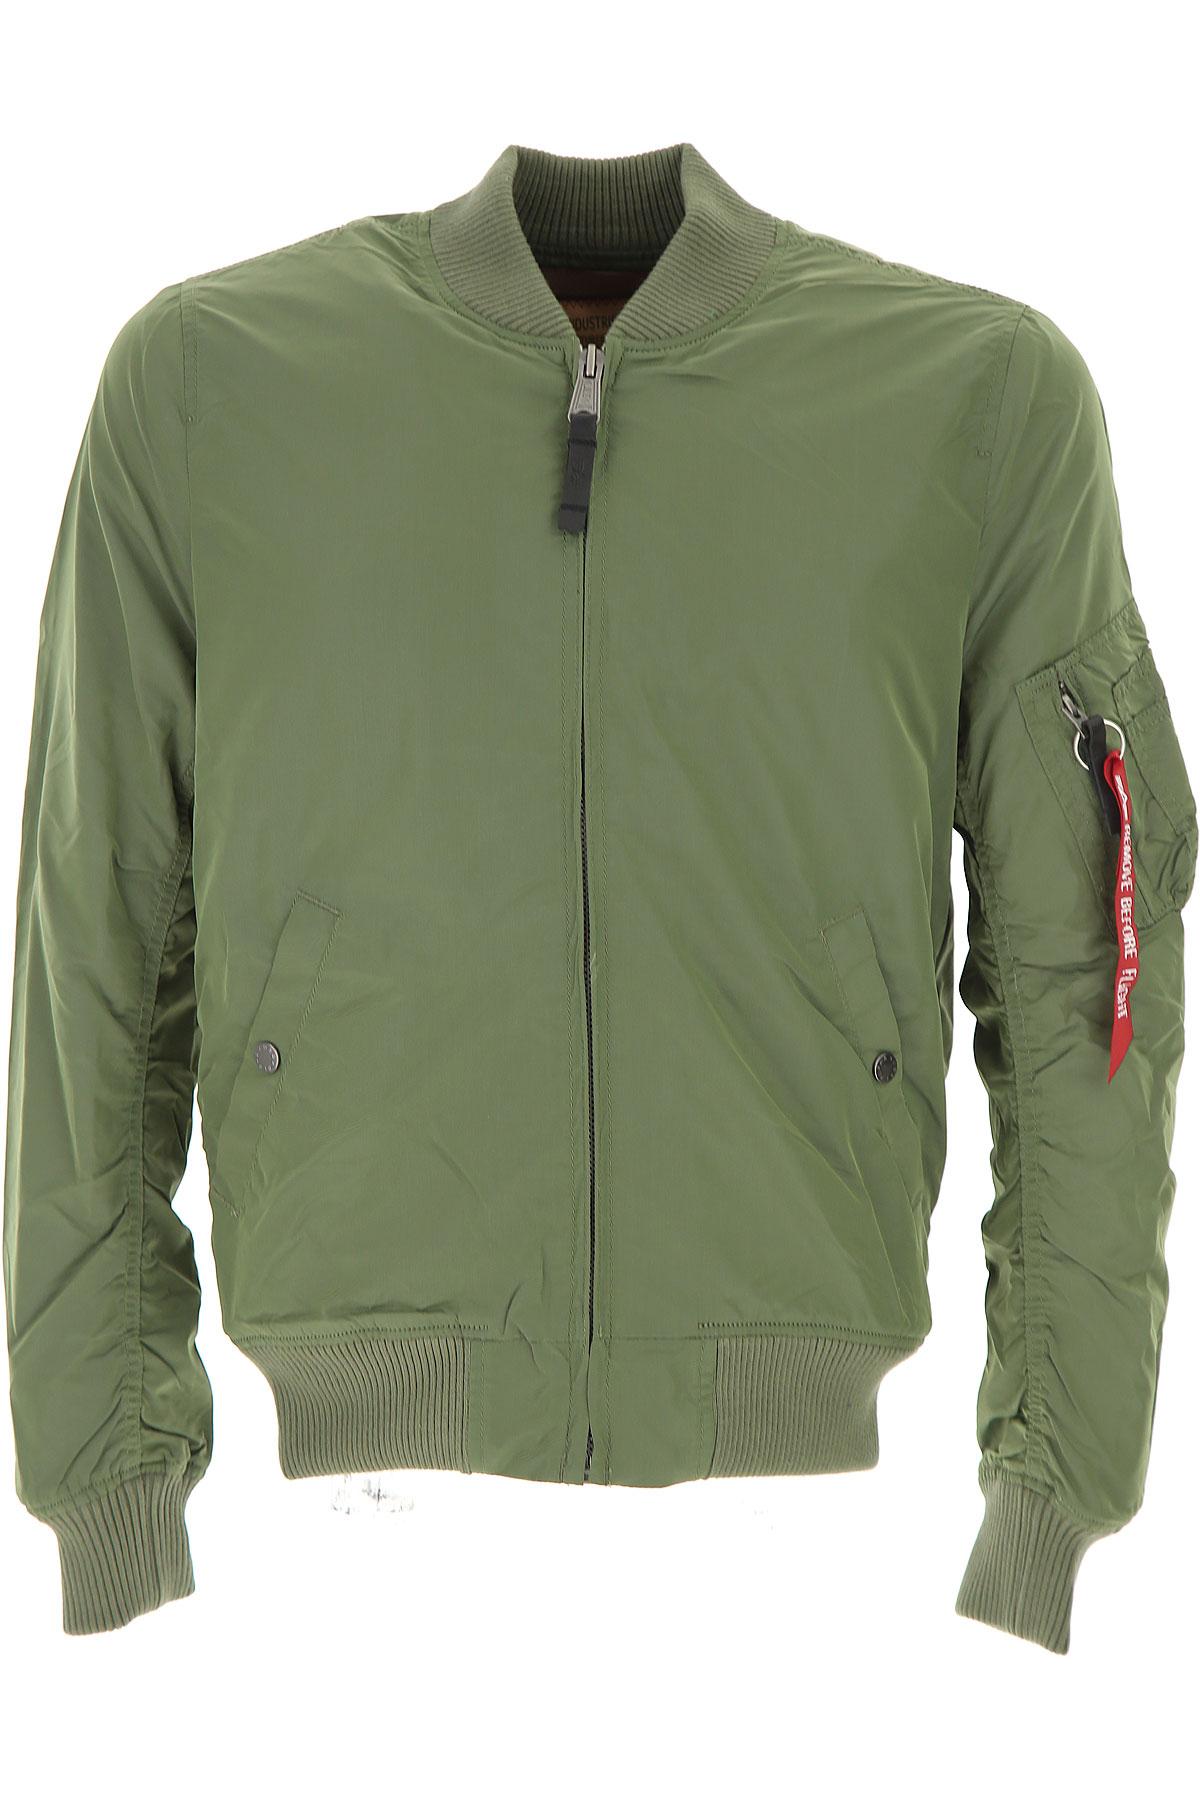 Image of Alpha Industries Jacket for Men On Sale, Sage Green, Nylon, 2017, L S